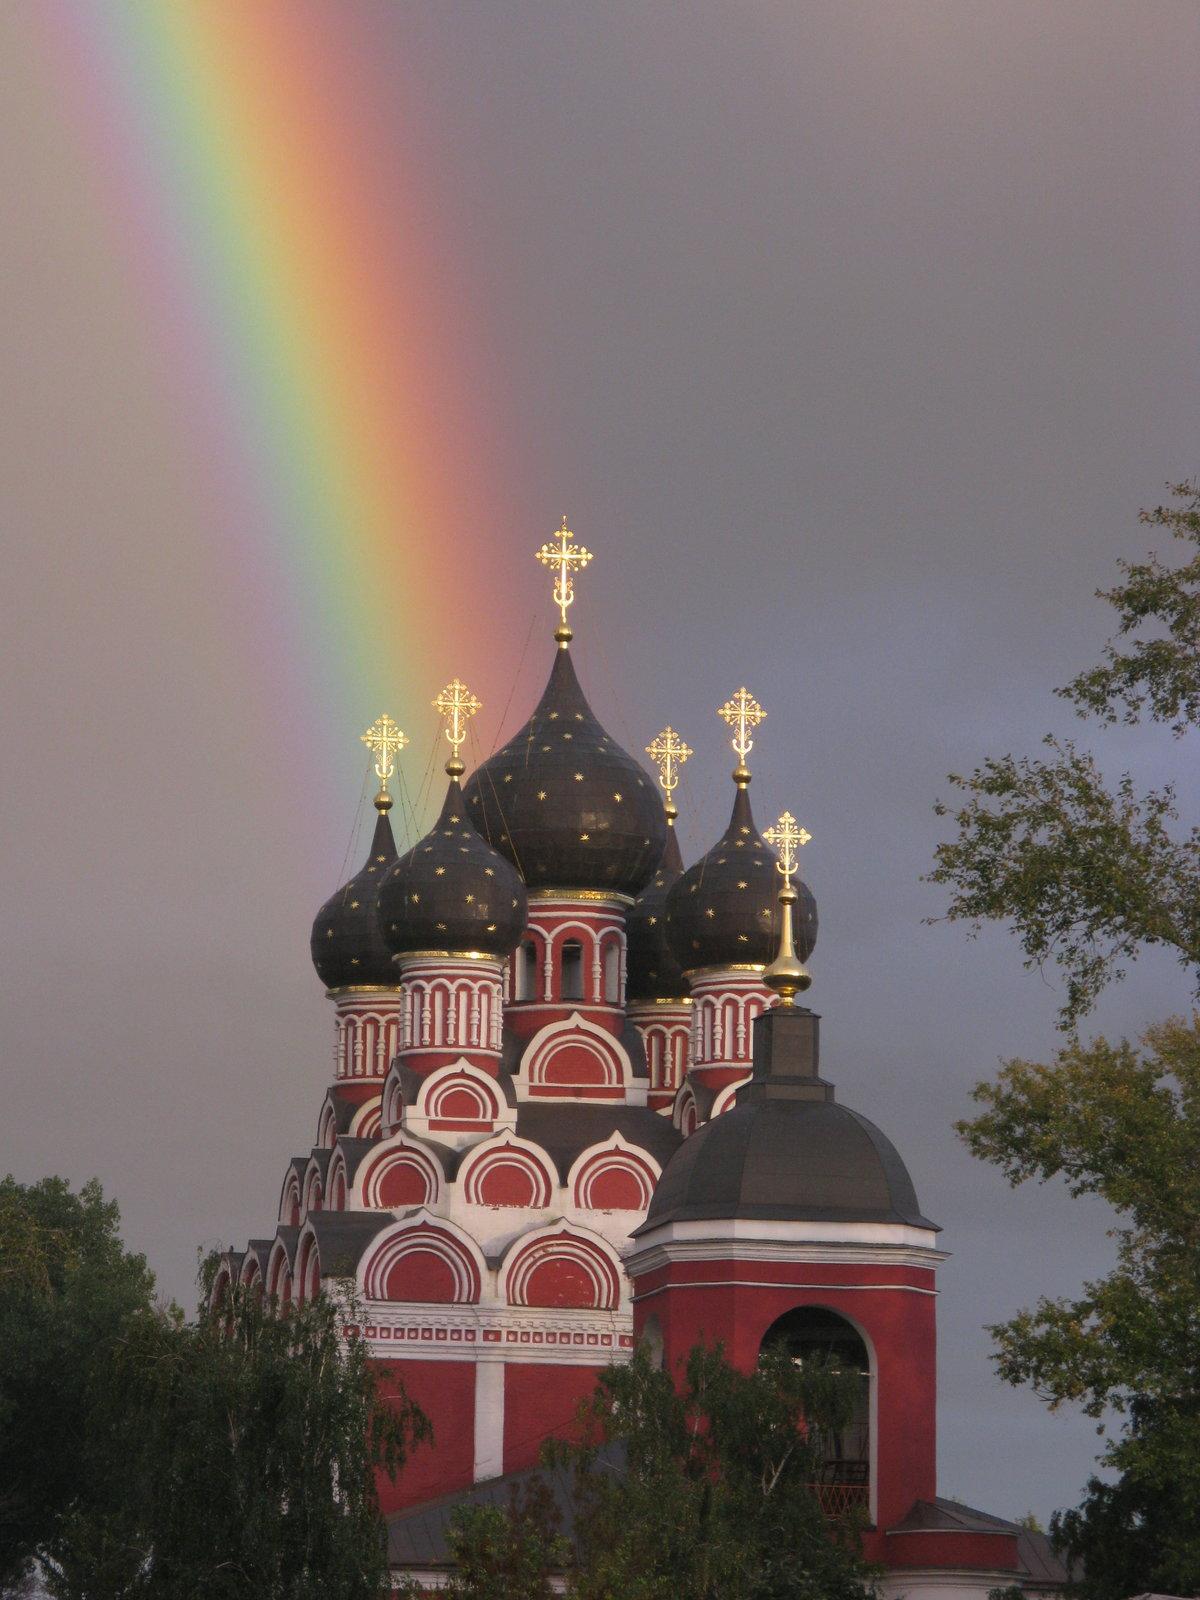 Дождь над храмом картинки